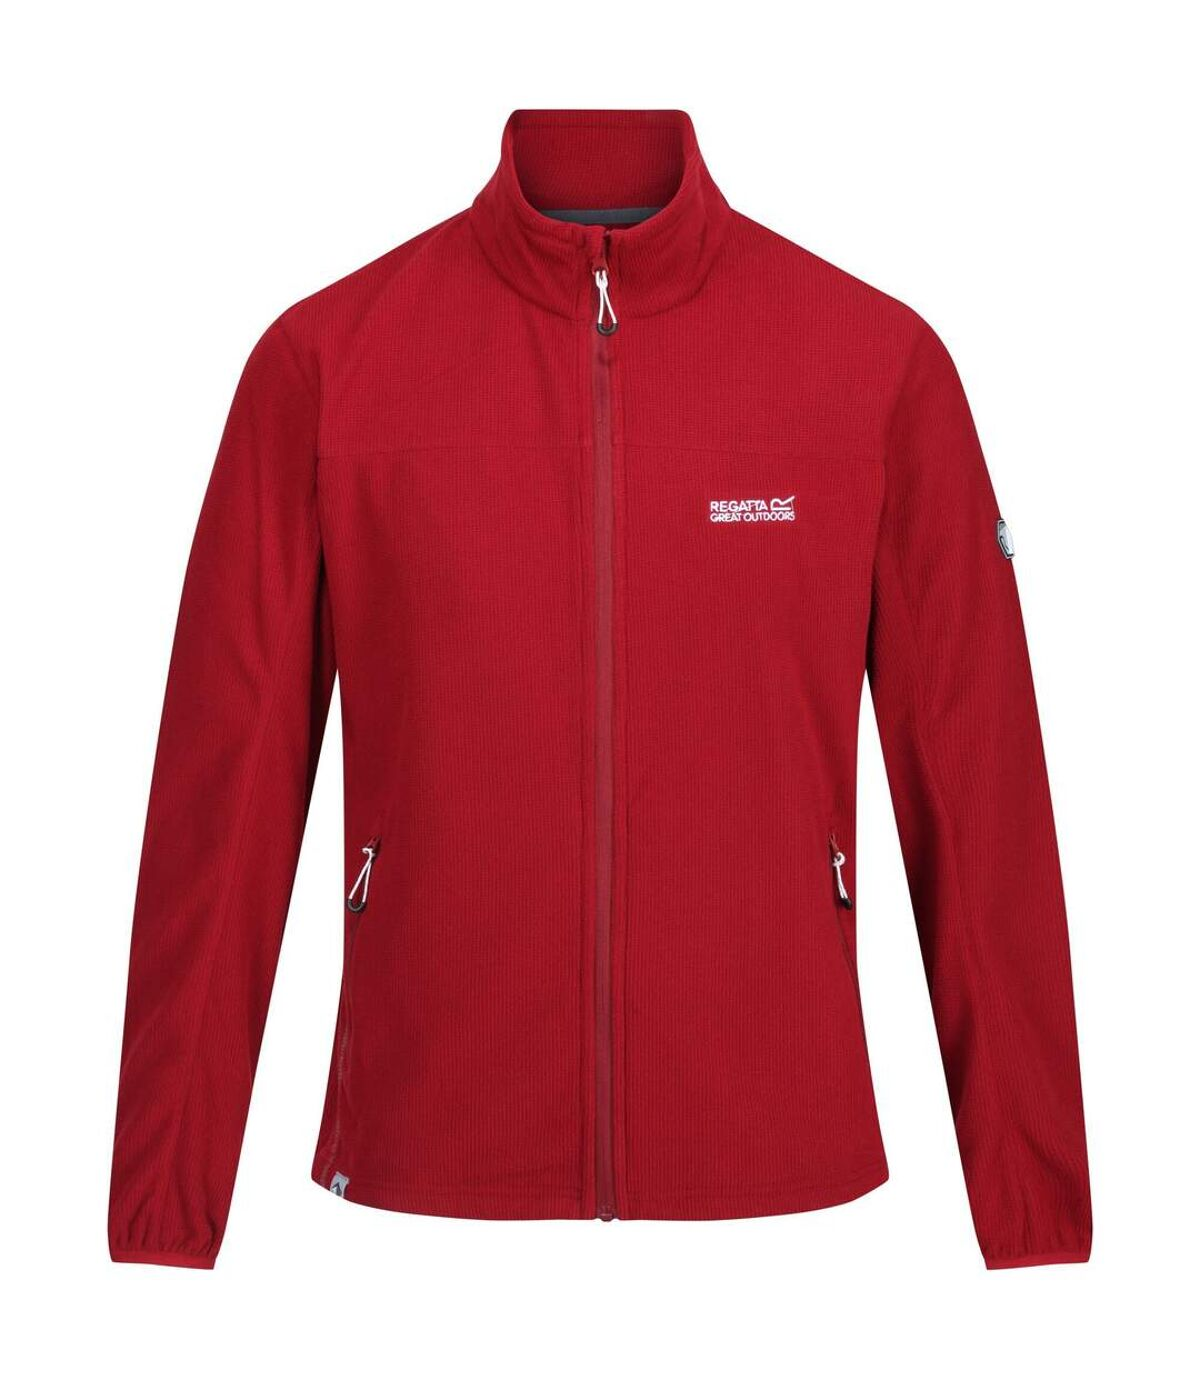 Regatta - Veste polaire STANNER - Homme (Rouge) - UTRG5044